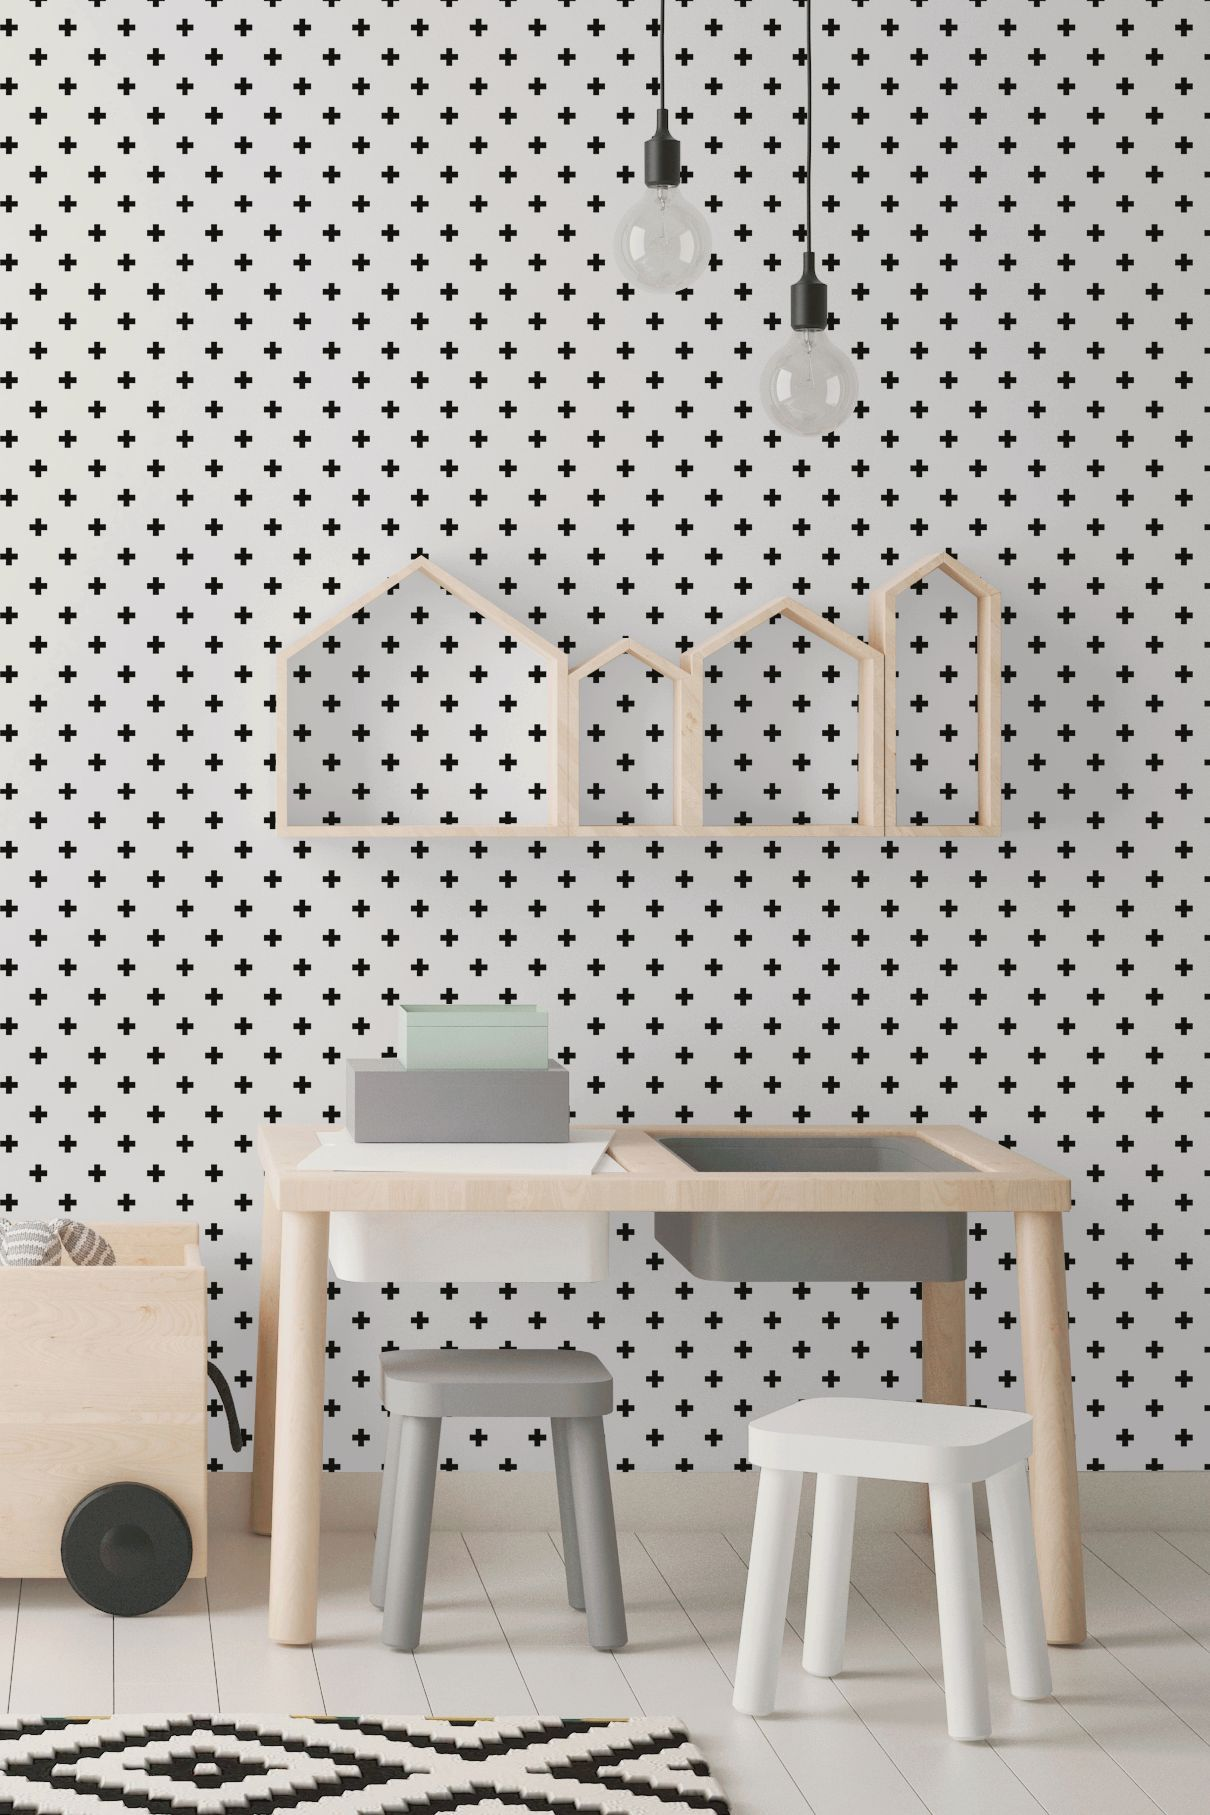 White And Black Cross Geometric Peel And Stick Removable Wallpaper 2016 Geometric Removable Wallpaper Geometric Wallpaper Design Removable Wallpaper